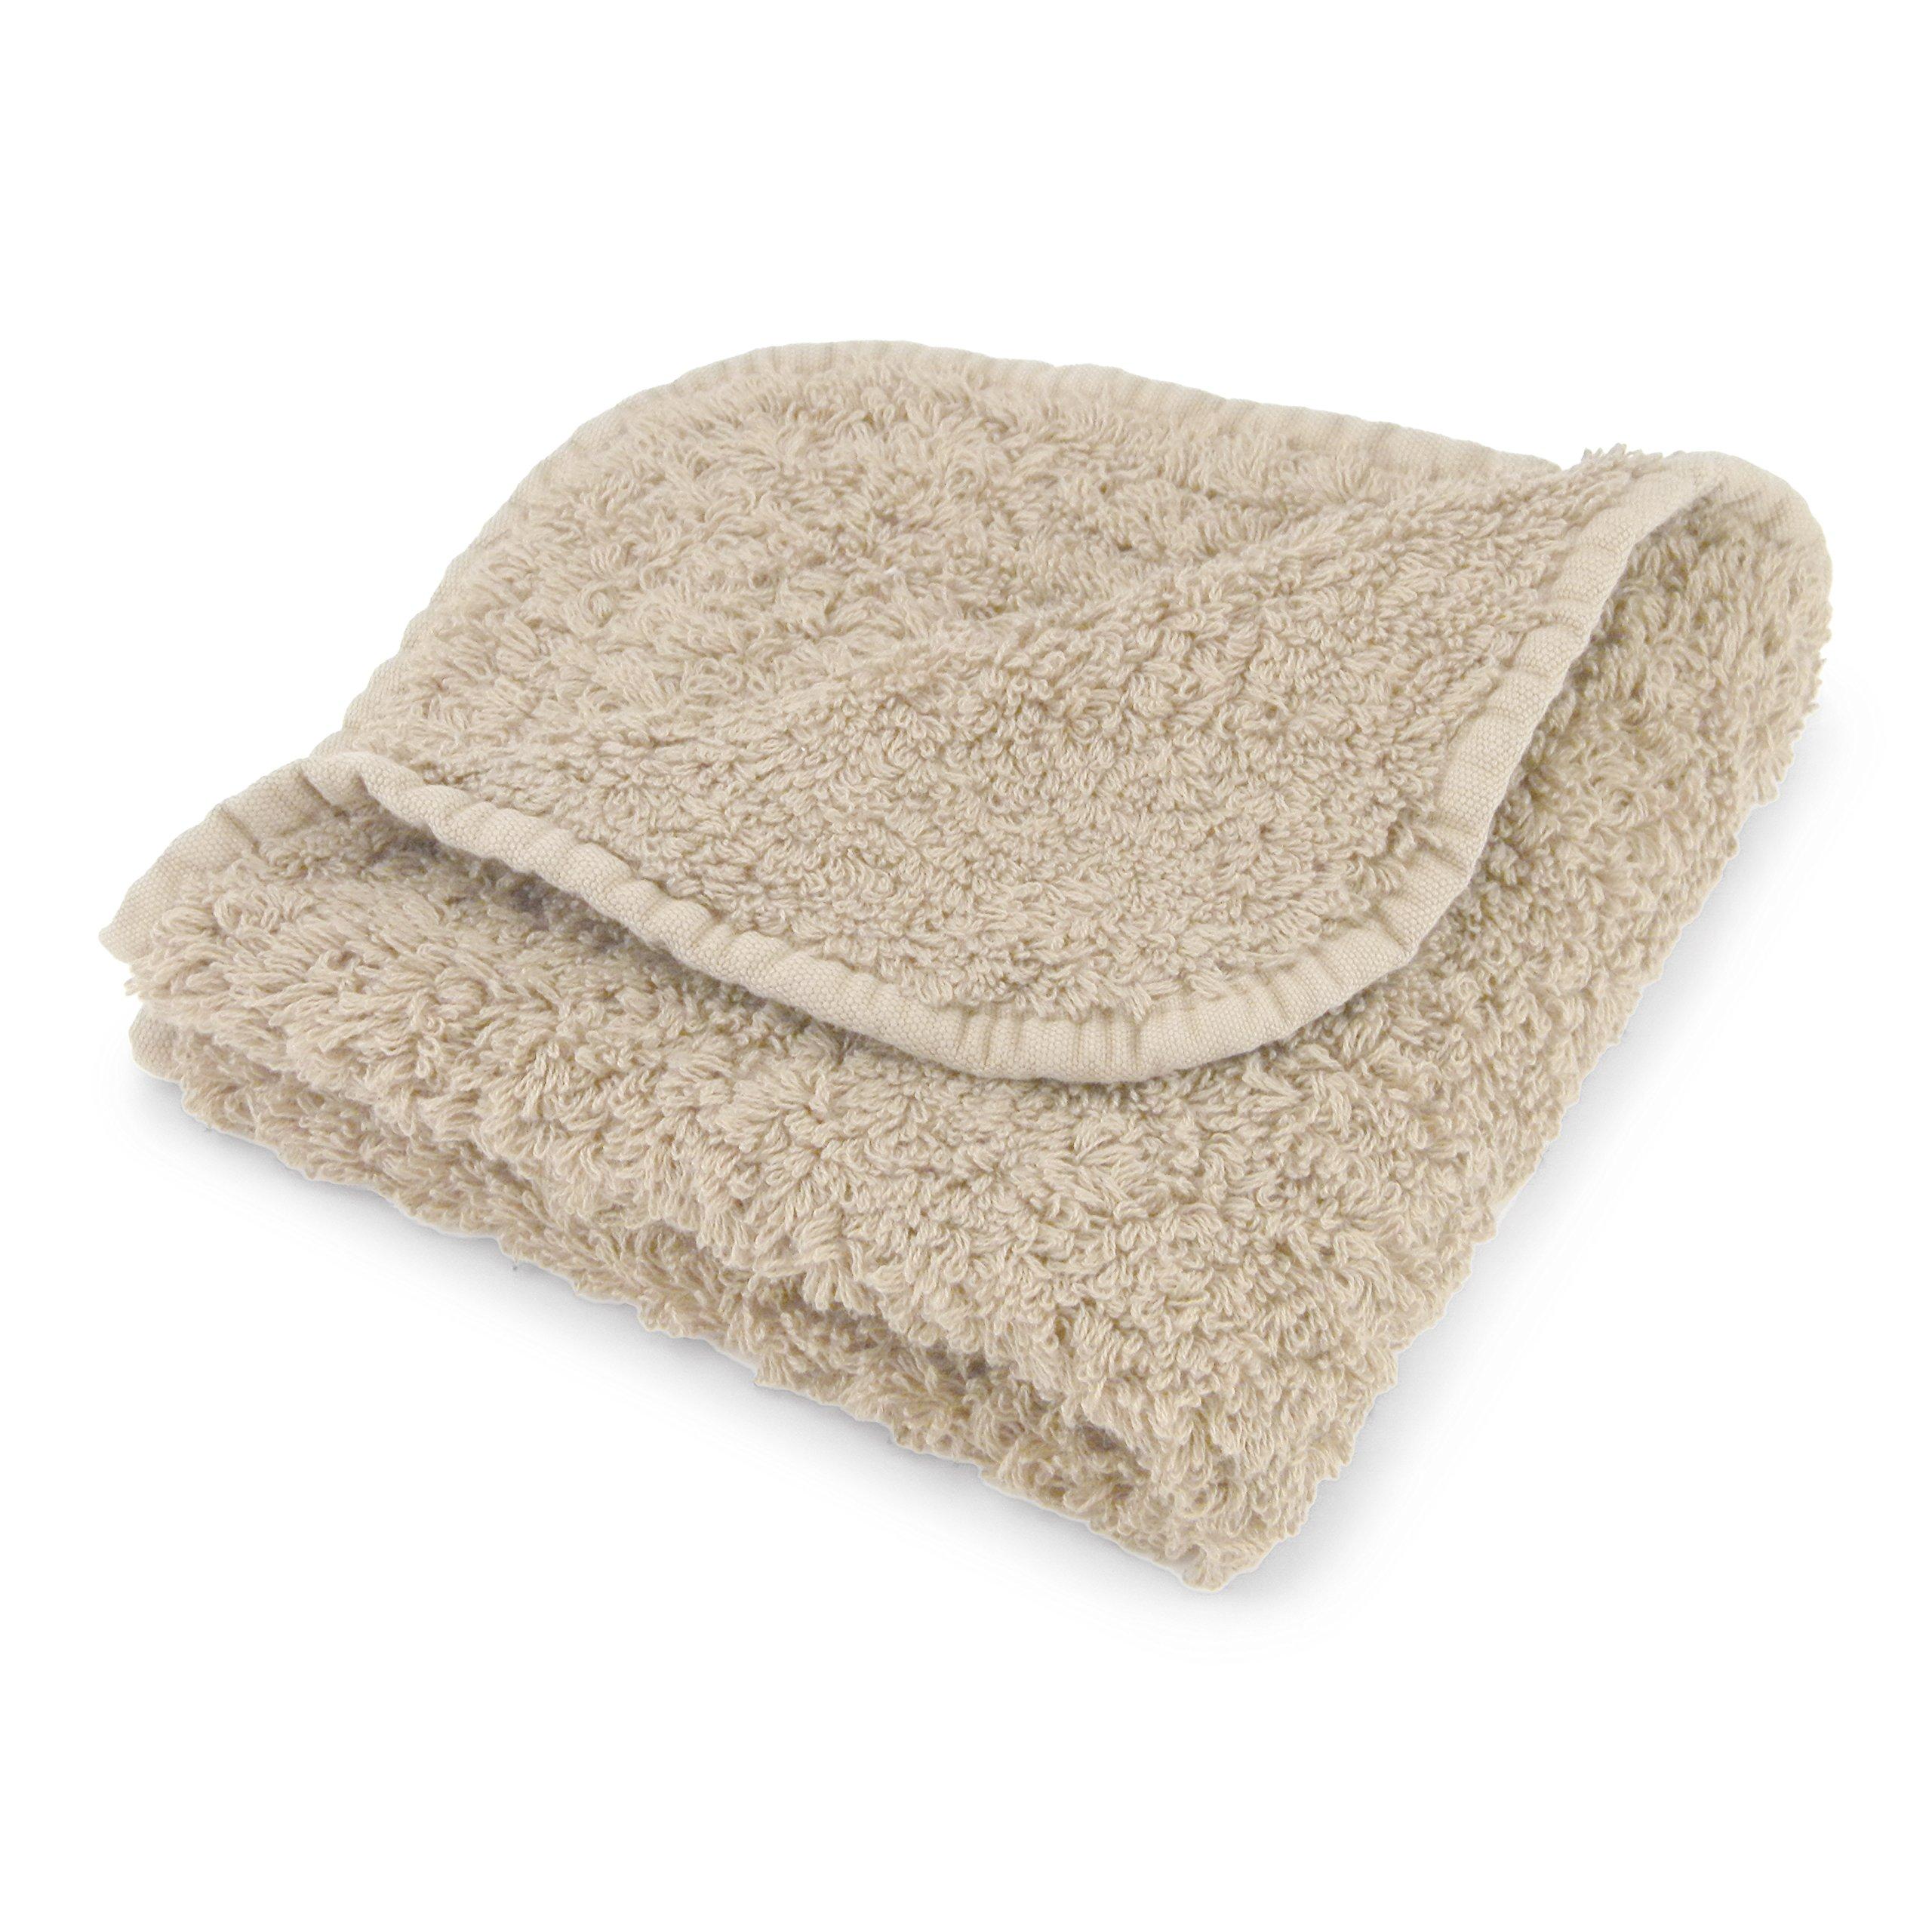 Abyss Super Pile Wash Cloth (12'' x 12'') - Linen (770)